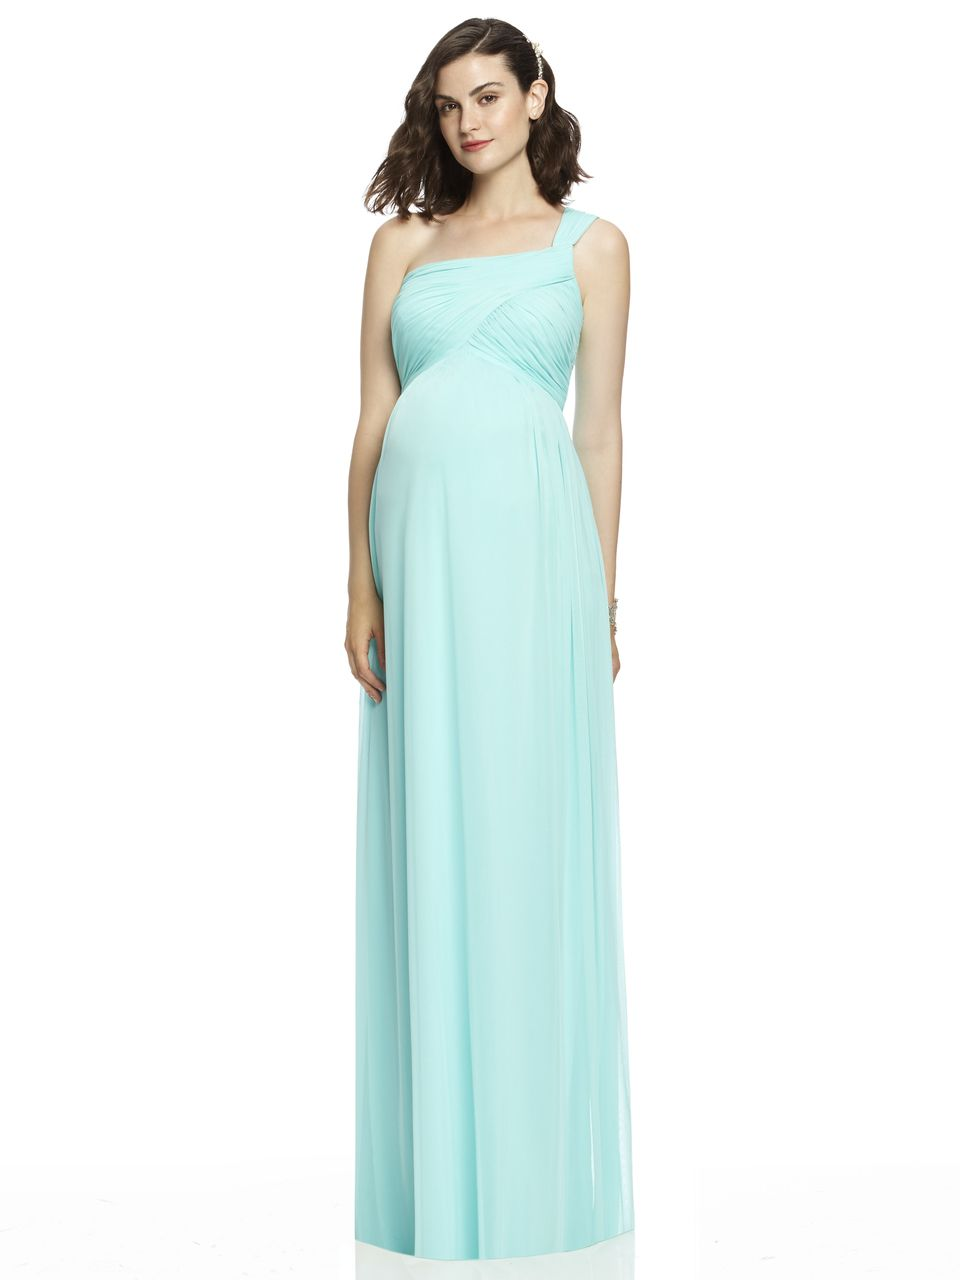 Dessy Maternity Bridesmaid Dress M427 | Blush Bridal | Blush Bridal ...